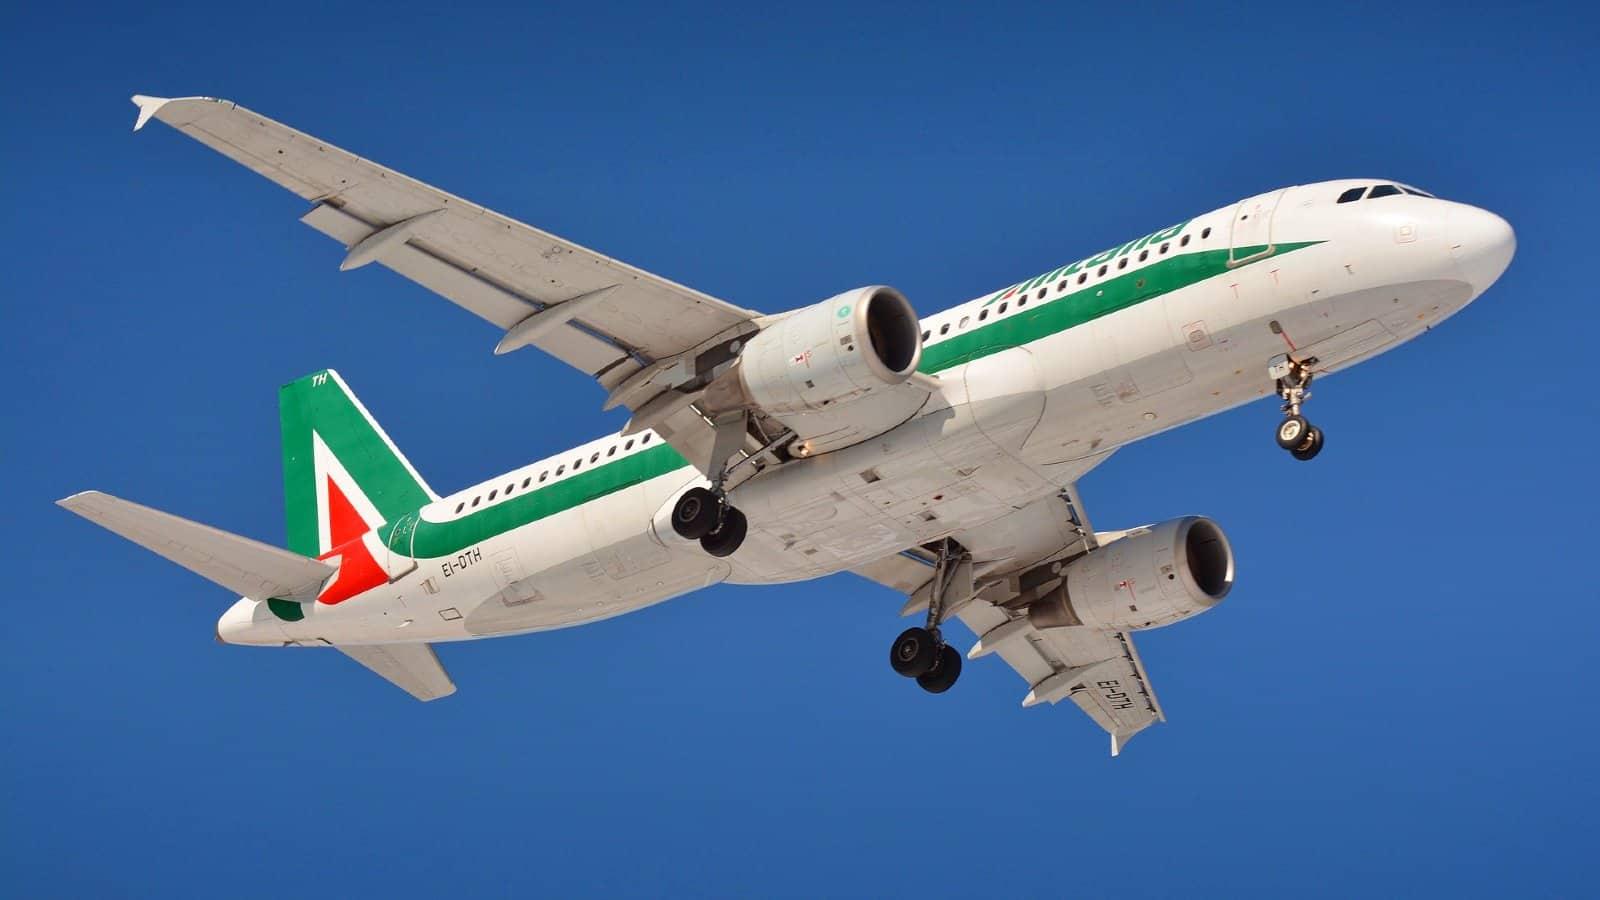 Web check-in online Alitalia